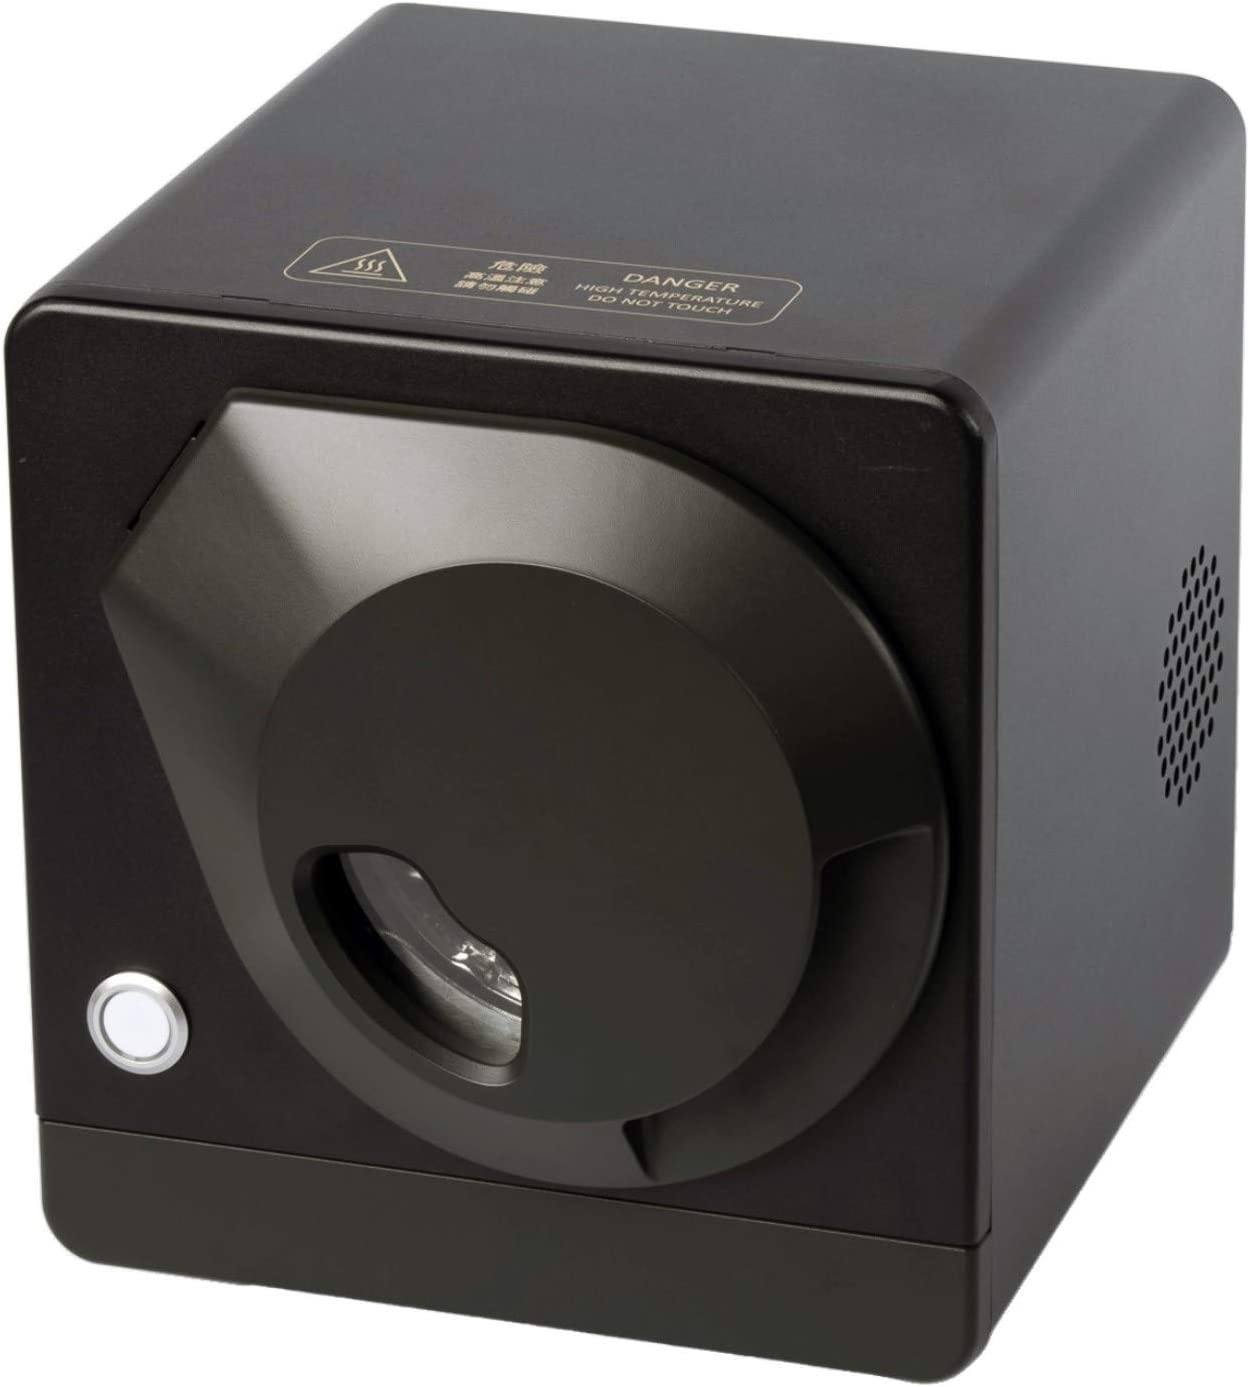 Sandbox Smart R1,Coffee Bean Roaster, Coffee Bean Roasting Machine use APP for Home 110V (Black)